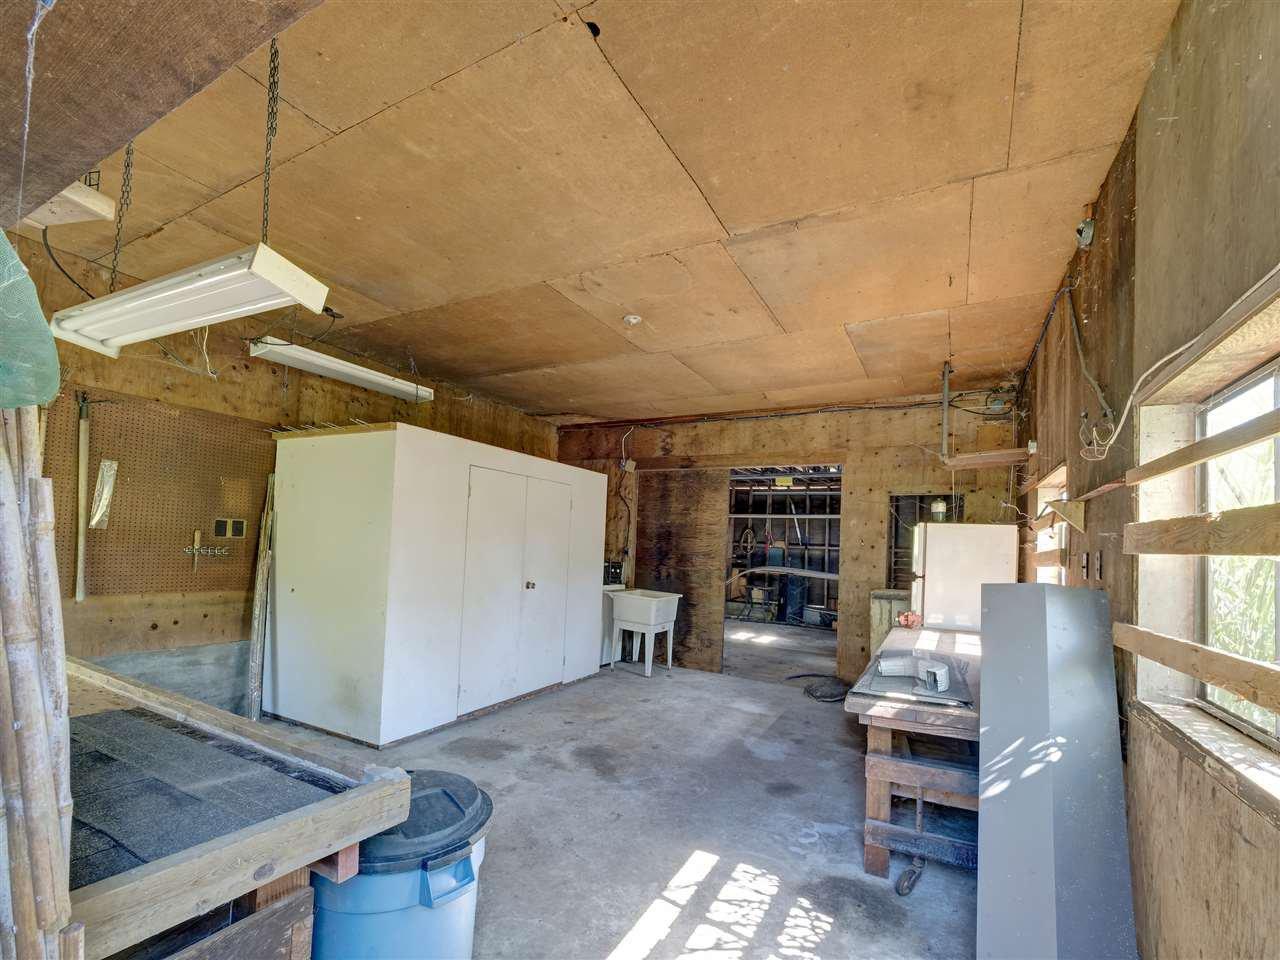 Photo 22: Photos: 5761 MCLAUGHAN Road in Sechelt: Sechelt District House for sale (Sunshine Coast)  : MLS®# R2479077